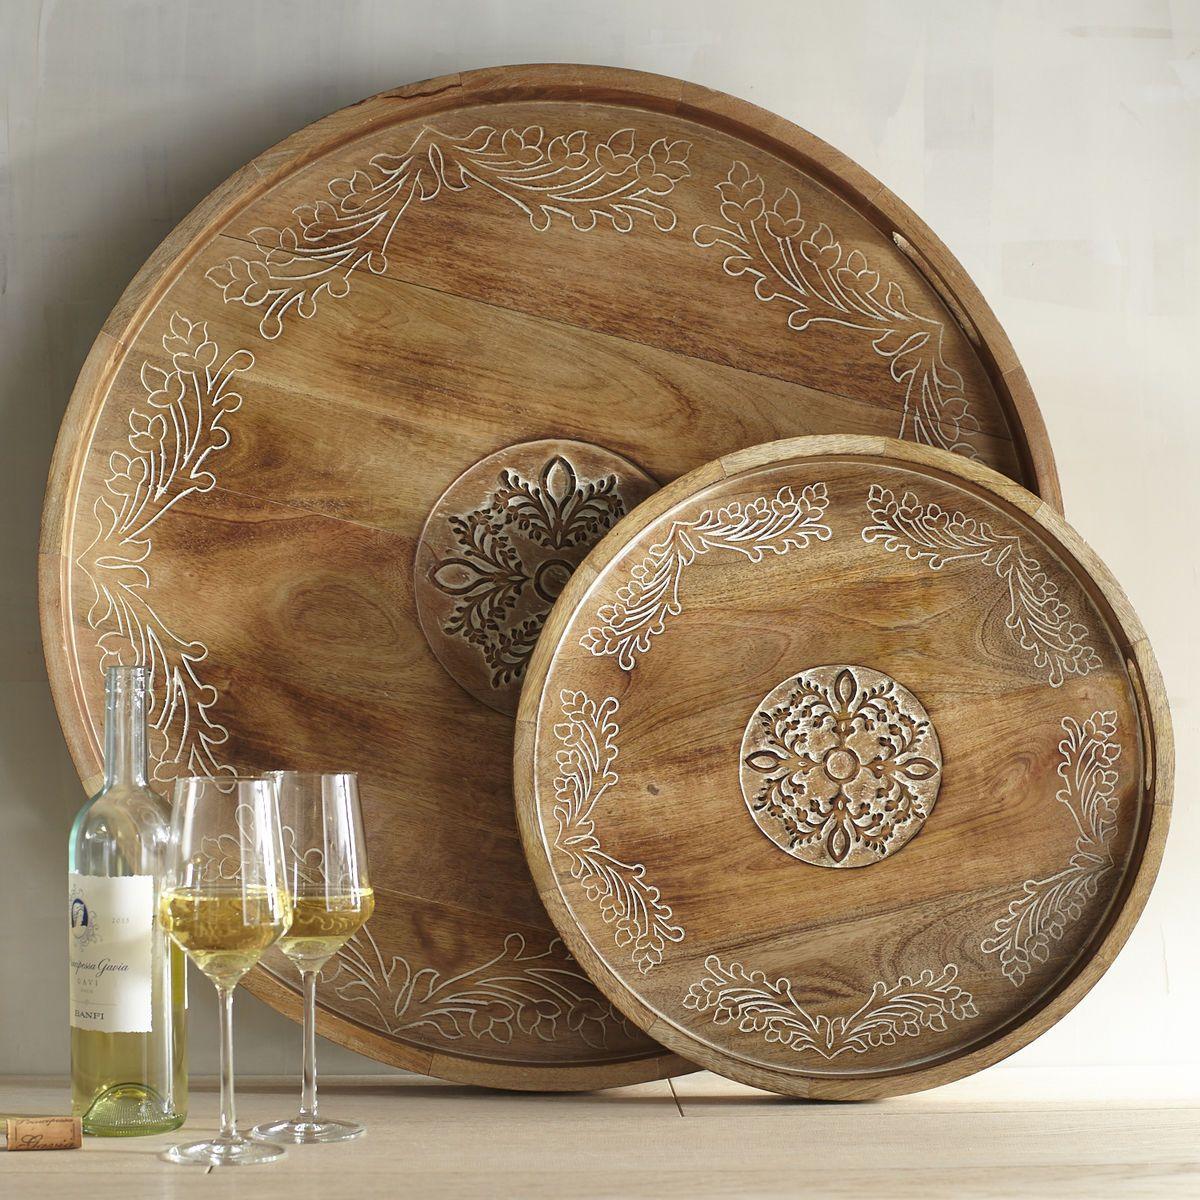 Tremendous Courtland Carved Round Trays Pier 1 Imports Round Tray Machost Co Dining Chair Design Ideas Machostcouk